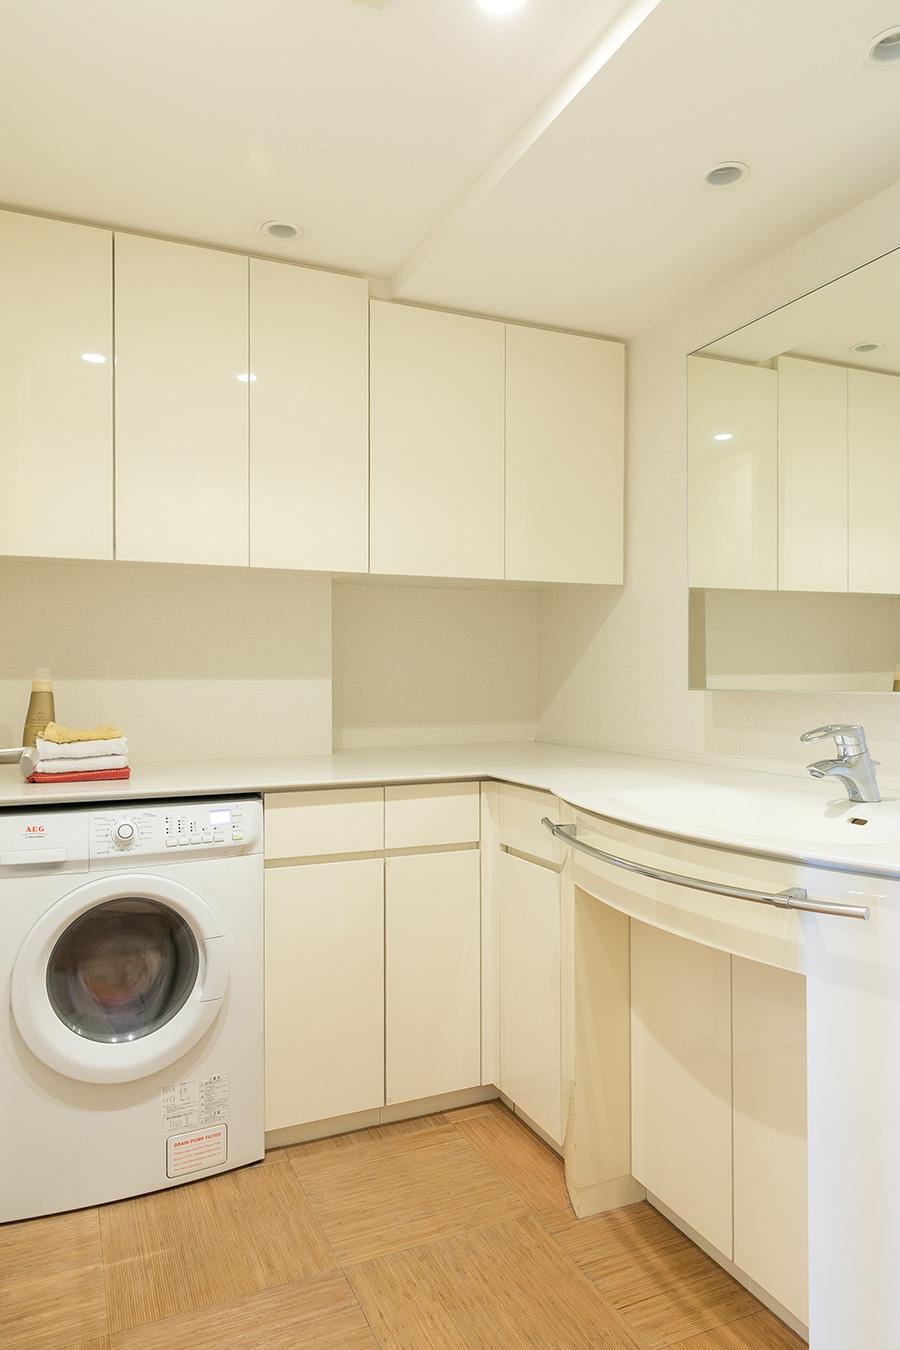 AEG製のビルトイン洗濯機を据えたホテルライクな設えの洗面所。